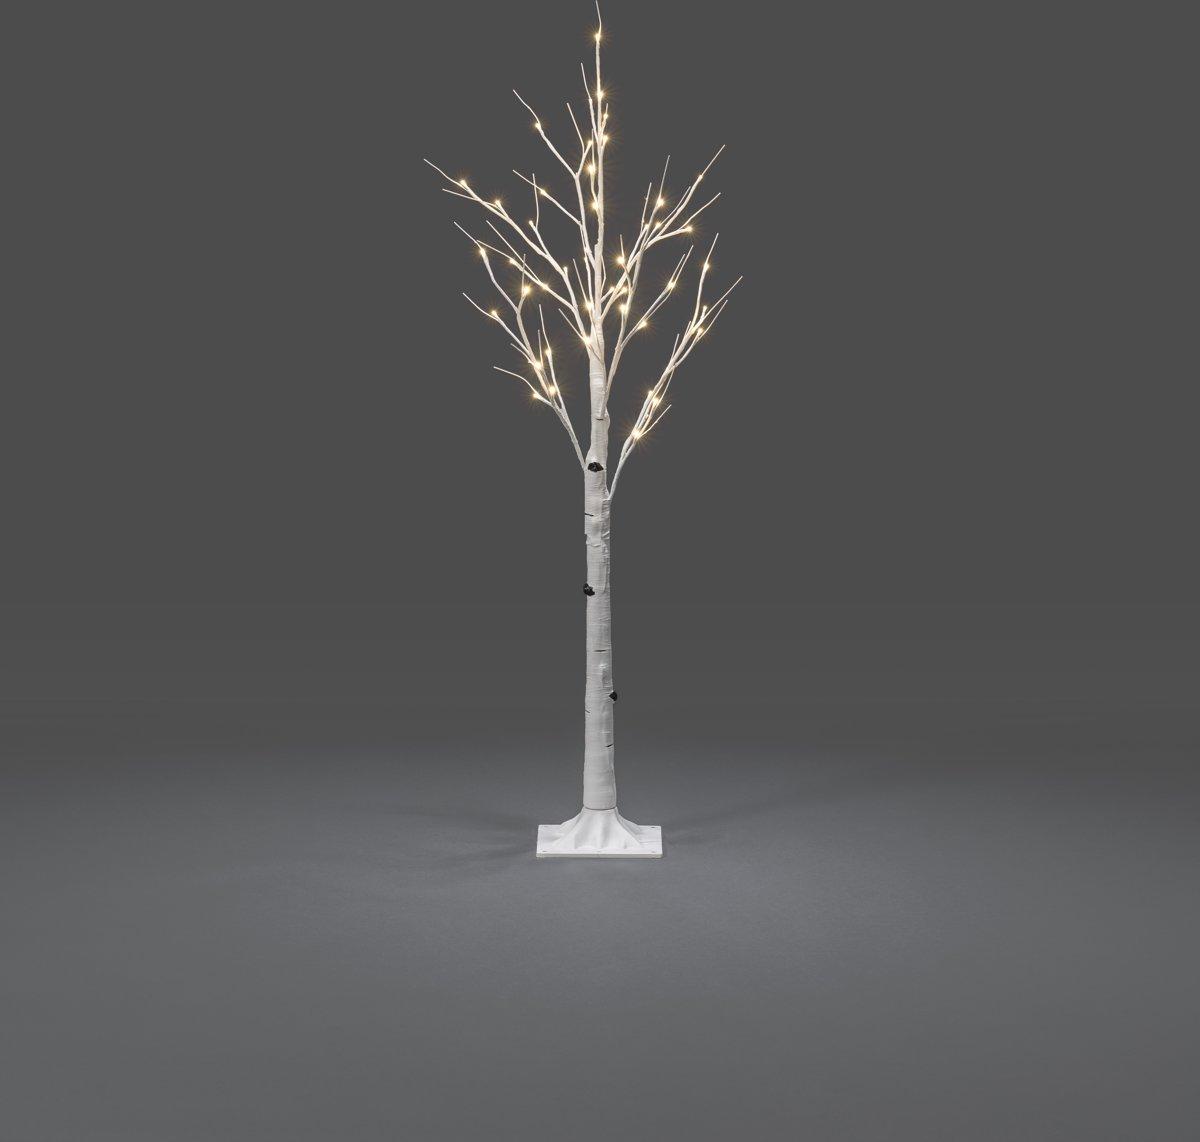 Konstsmide - LED berk op voet 120cm 24V 48x - warmwit kopen